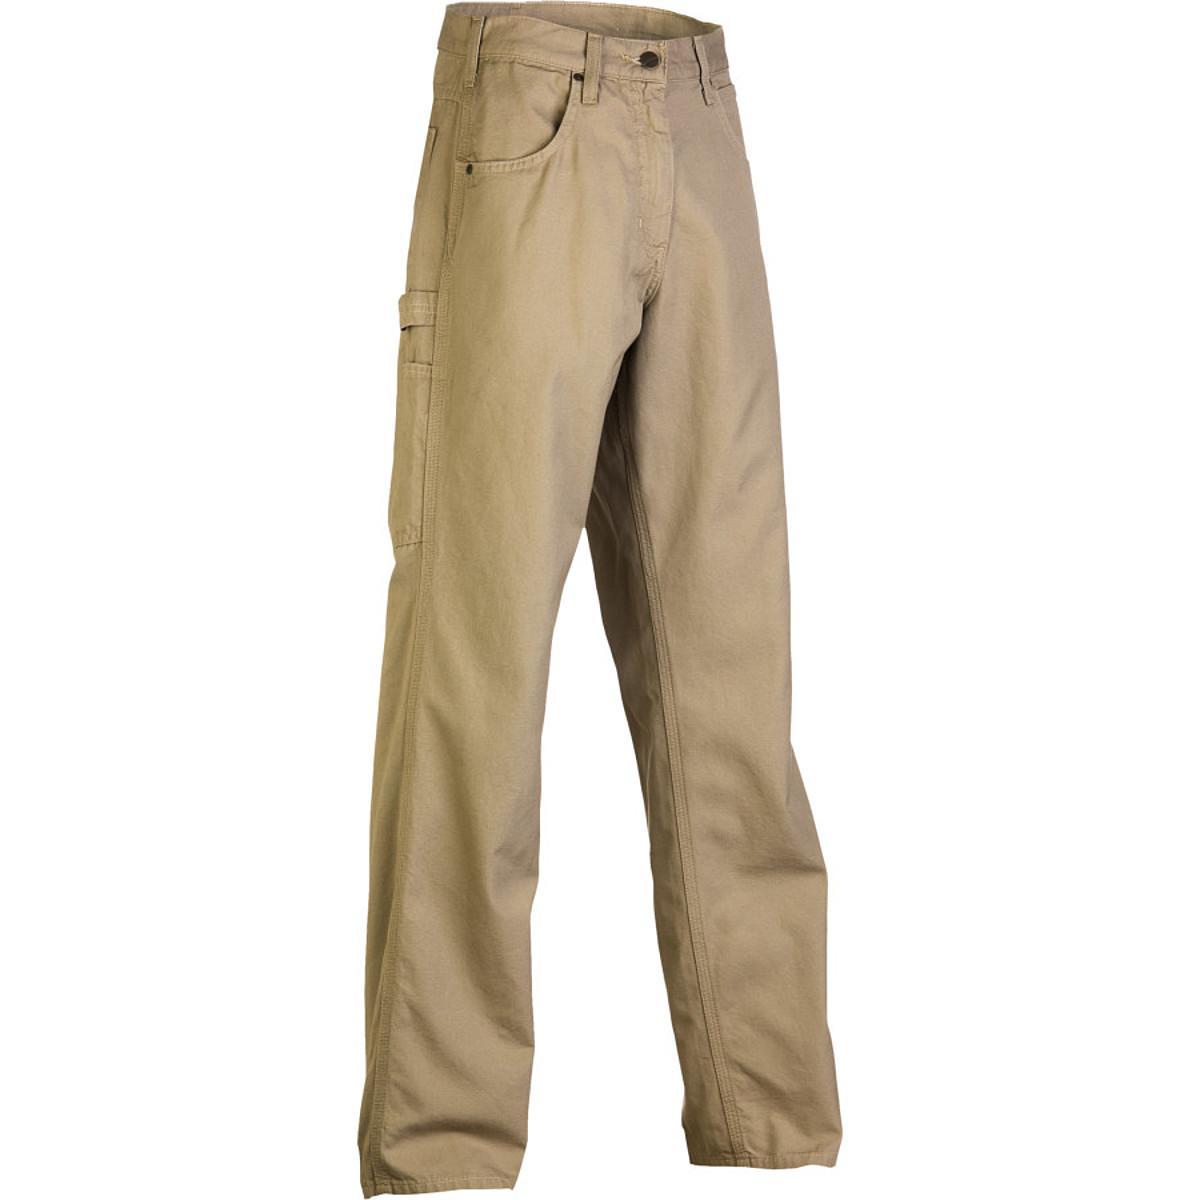 Carhartt Loose-Fit Canvas Carpenter Denim Pant - Men's